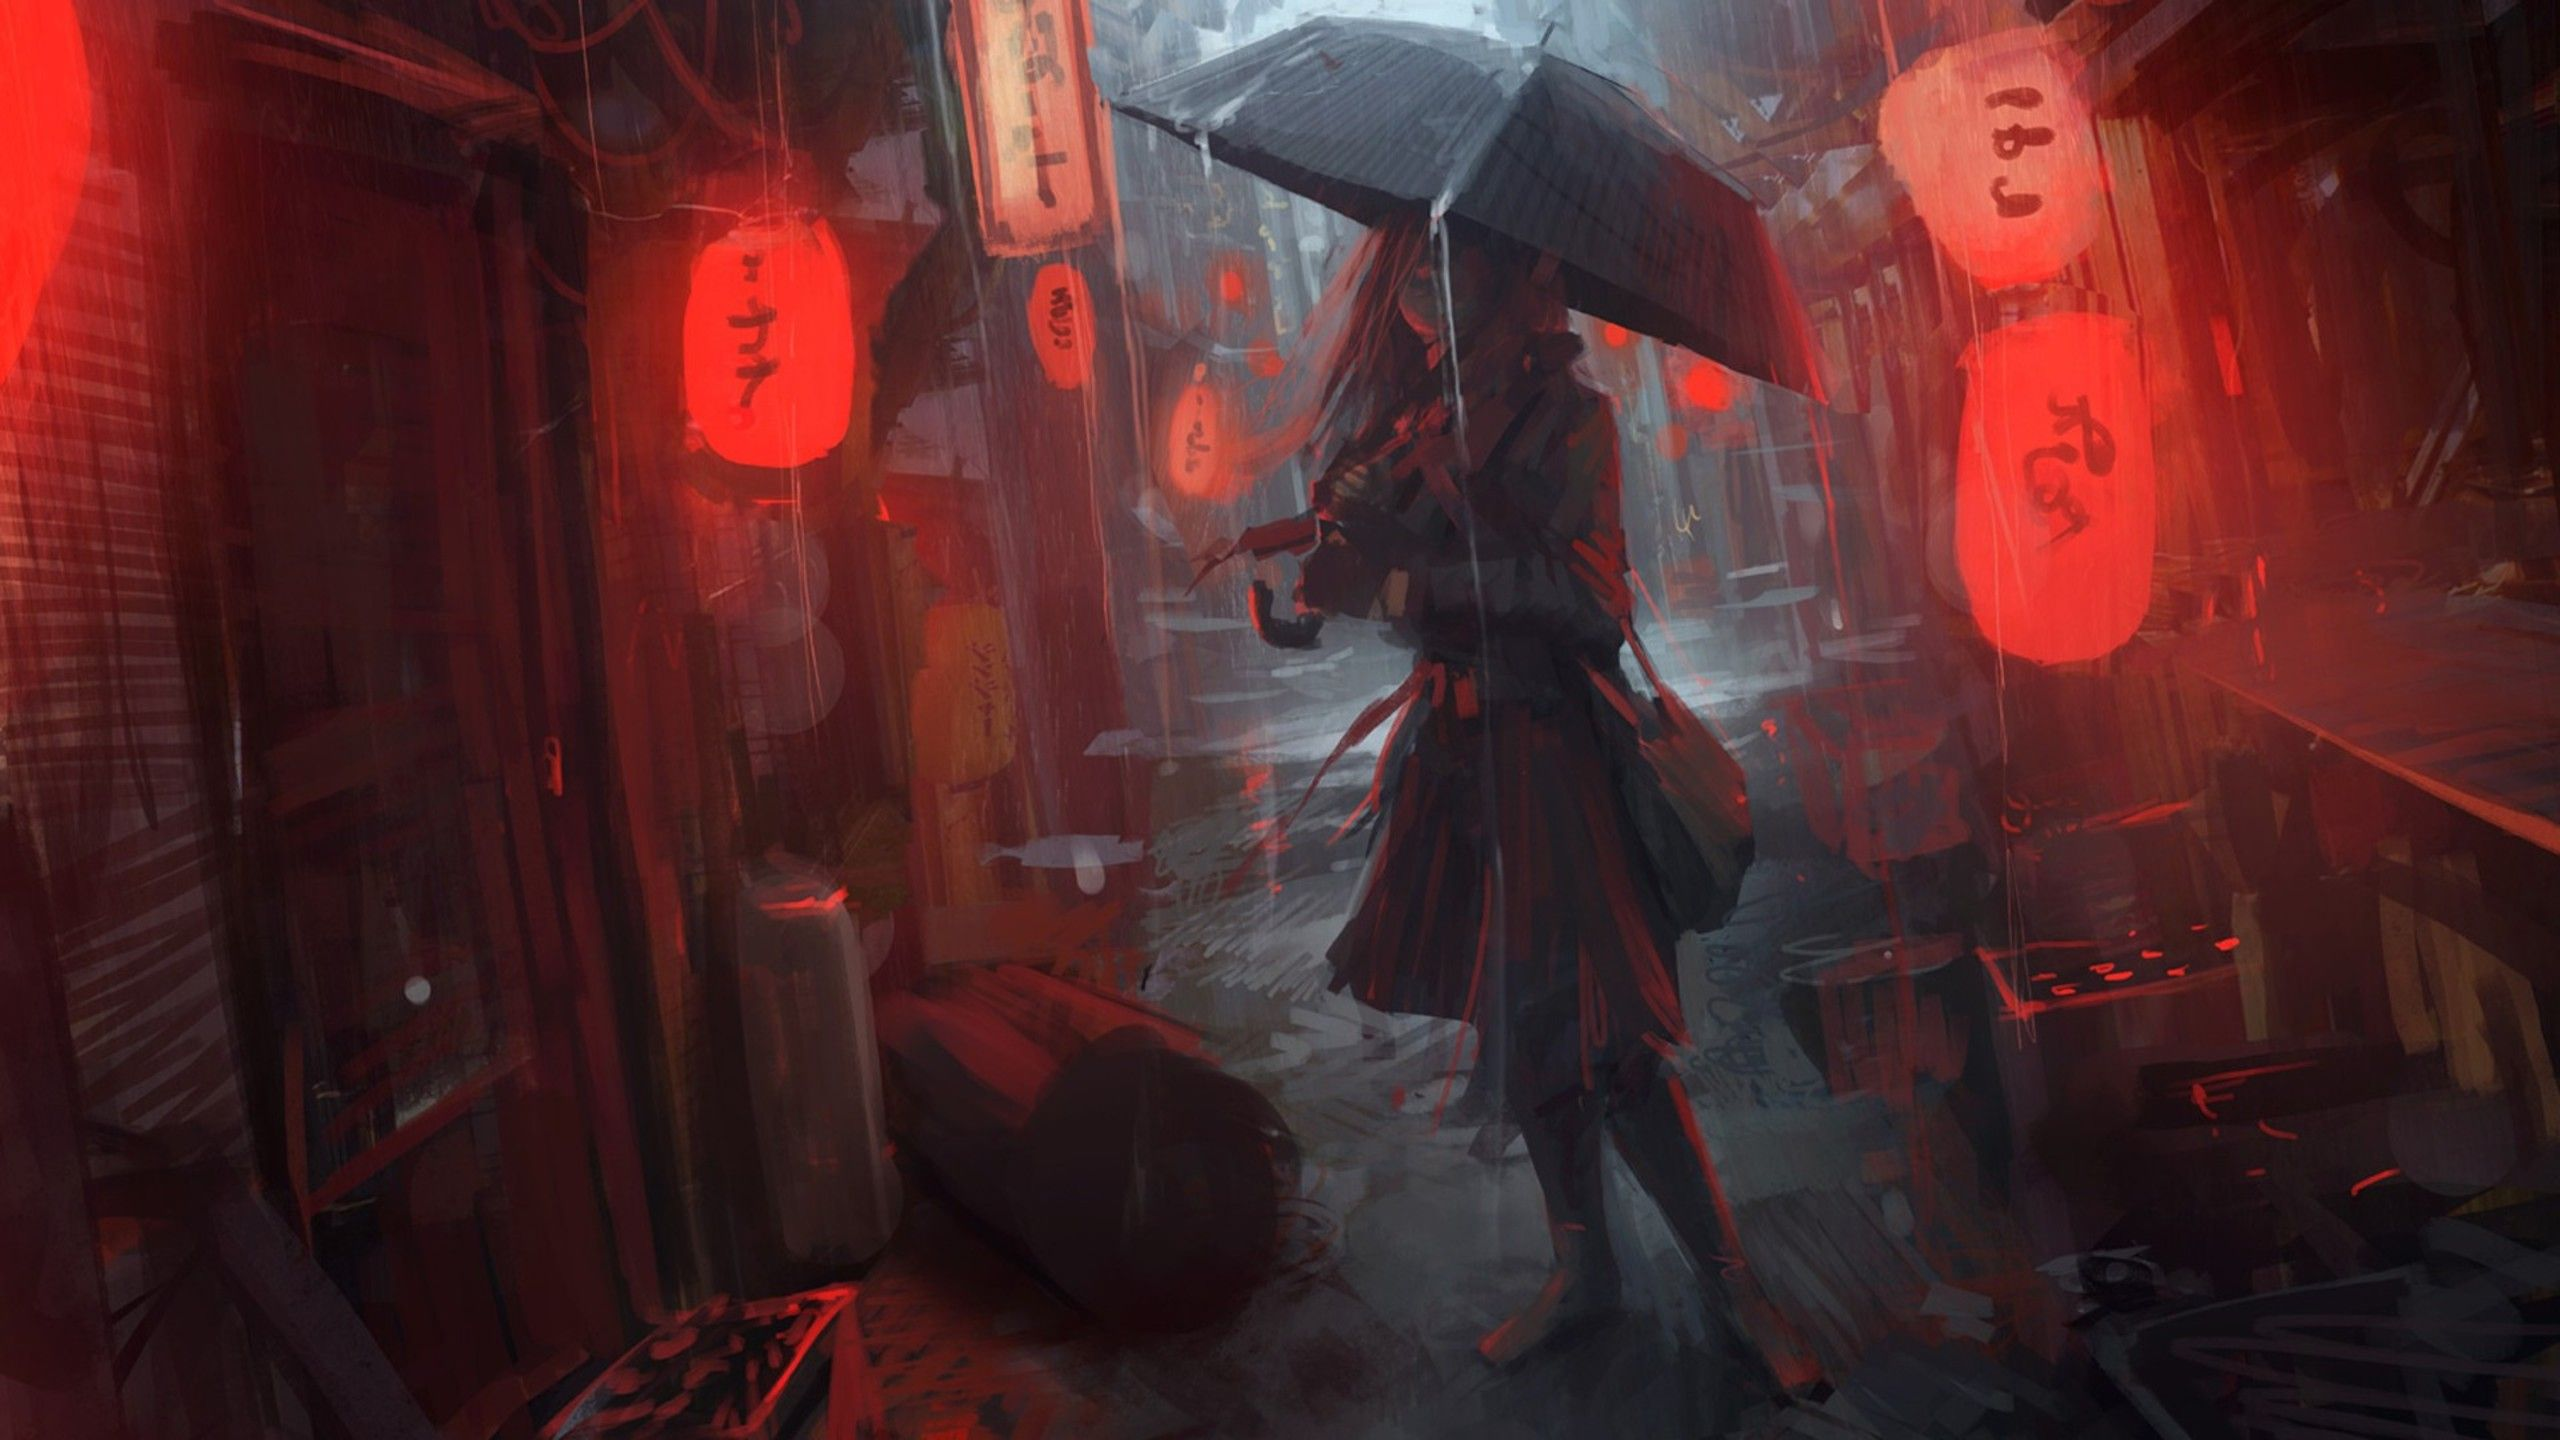 Lost In Rain Umbrella Illustration Digital Art Anime Umbrella Girl